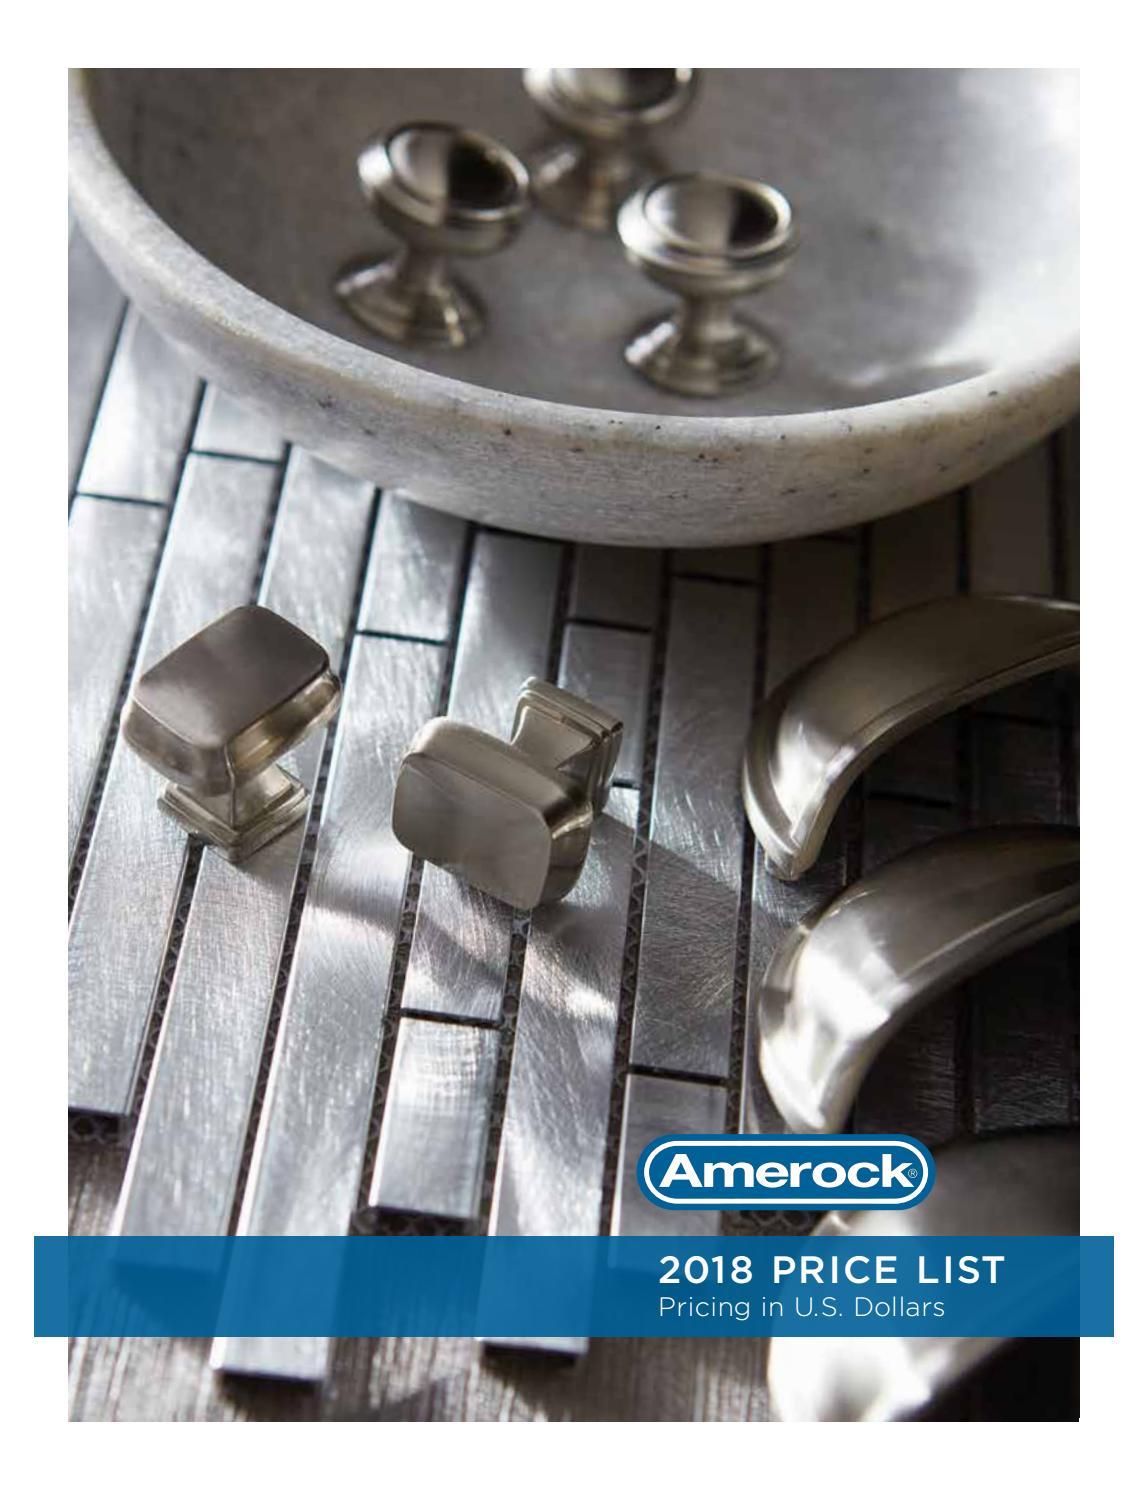 AMEROCK WHEAT PULLS   OIL RUBBED BRONZE  BP1580-ORB  INSPIRATIONS